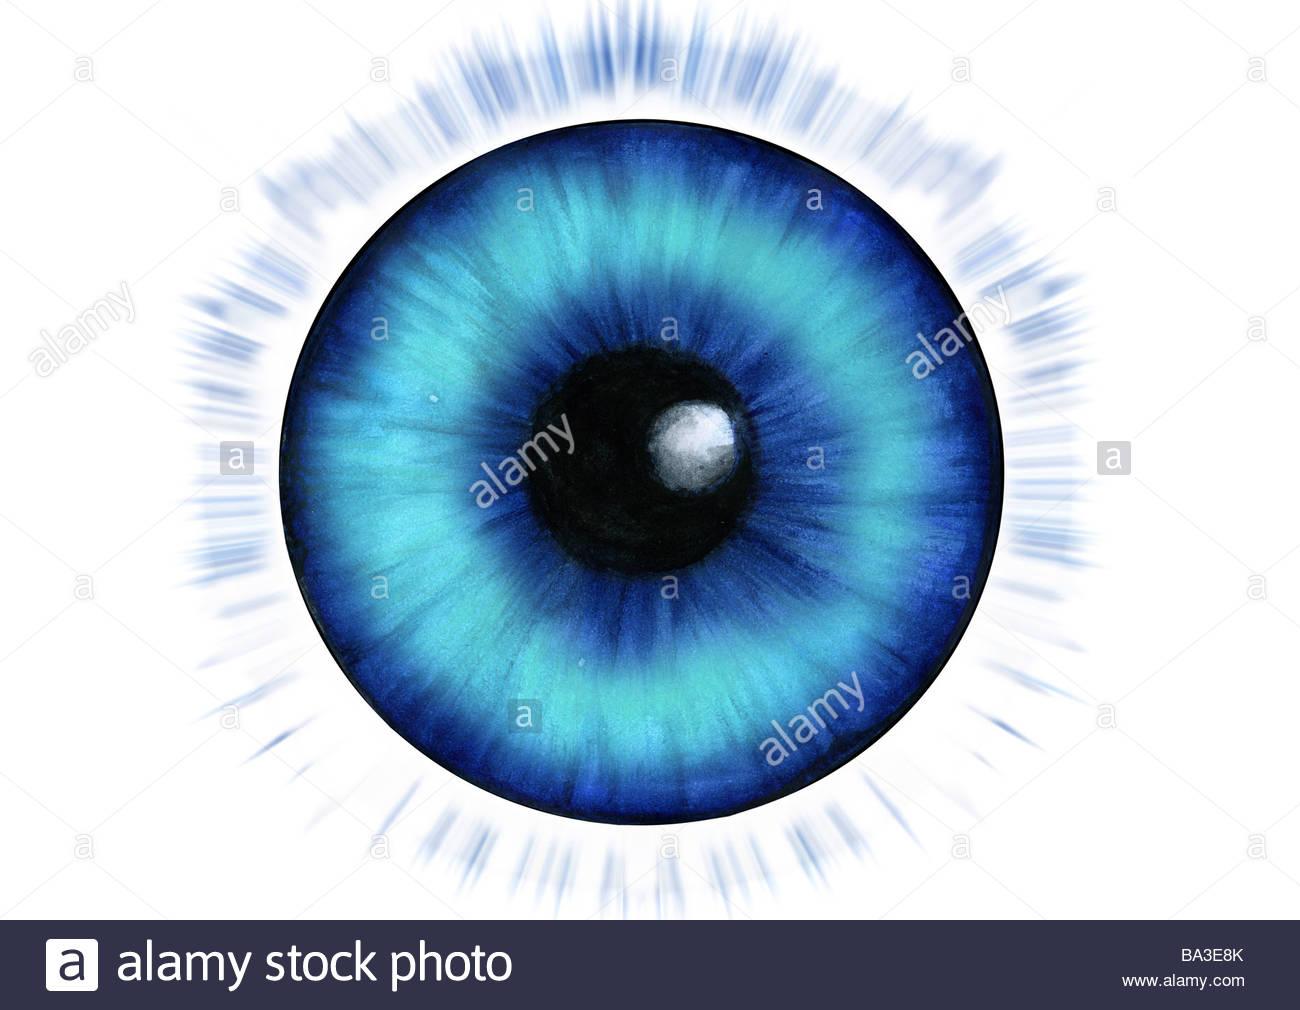 1300x1010 Illustration Eye Iris Gaze Beaming Graphics Drawing Watercolor